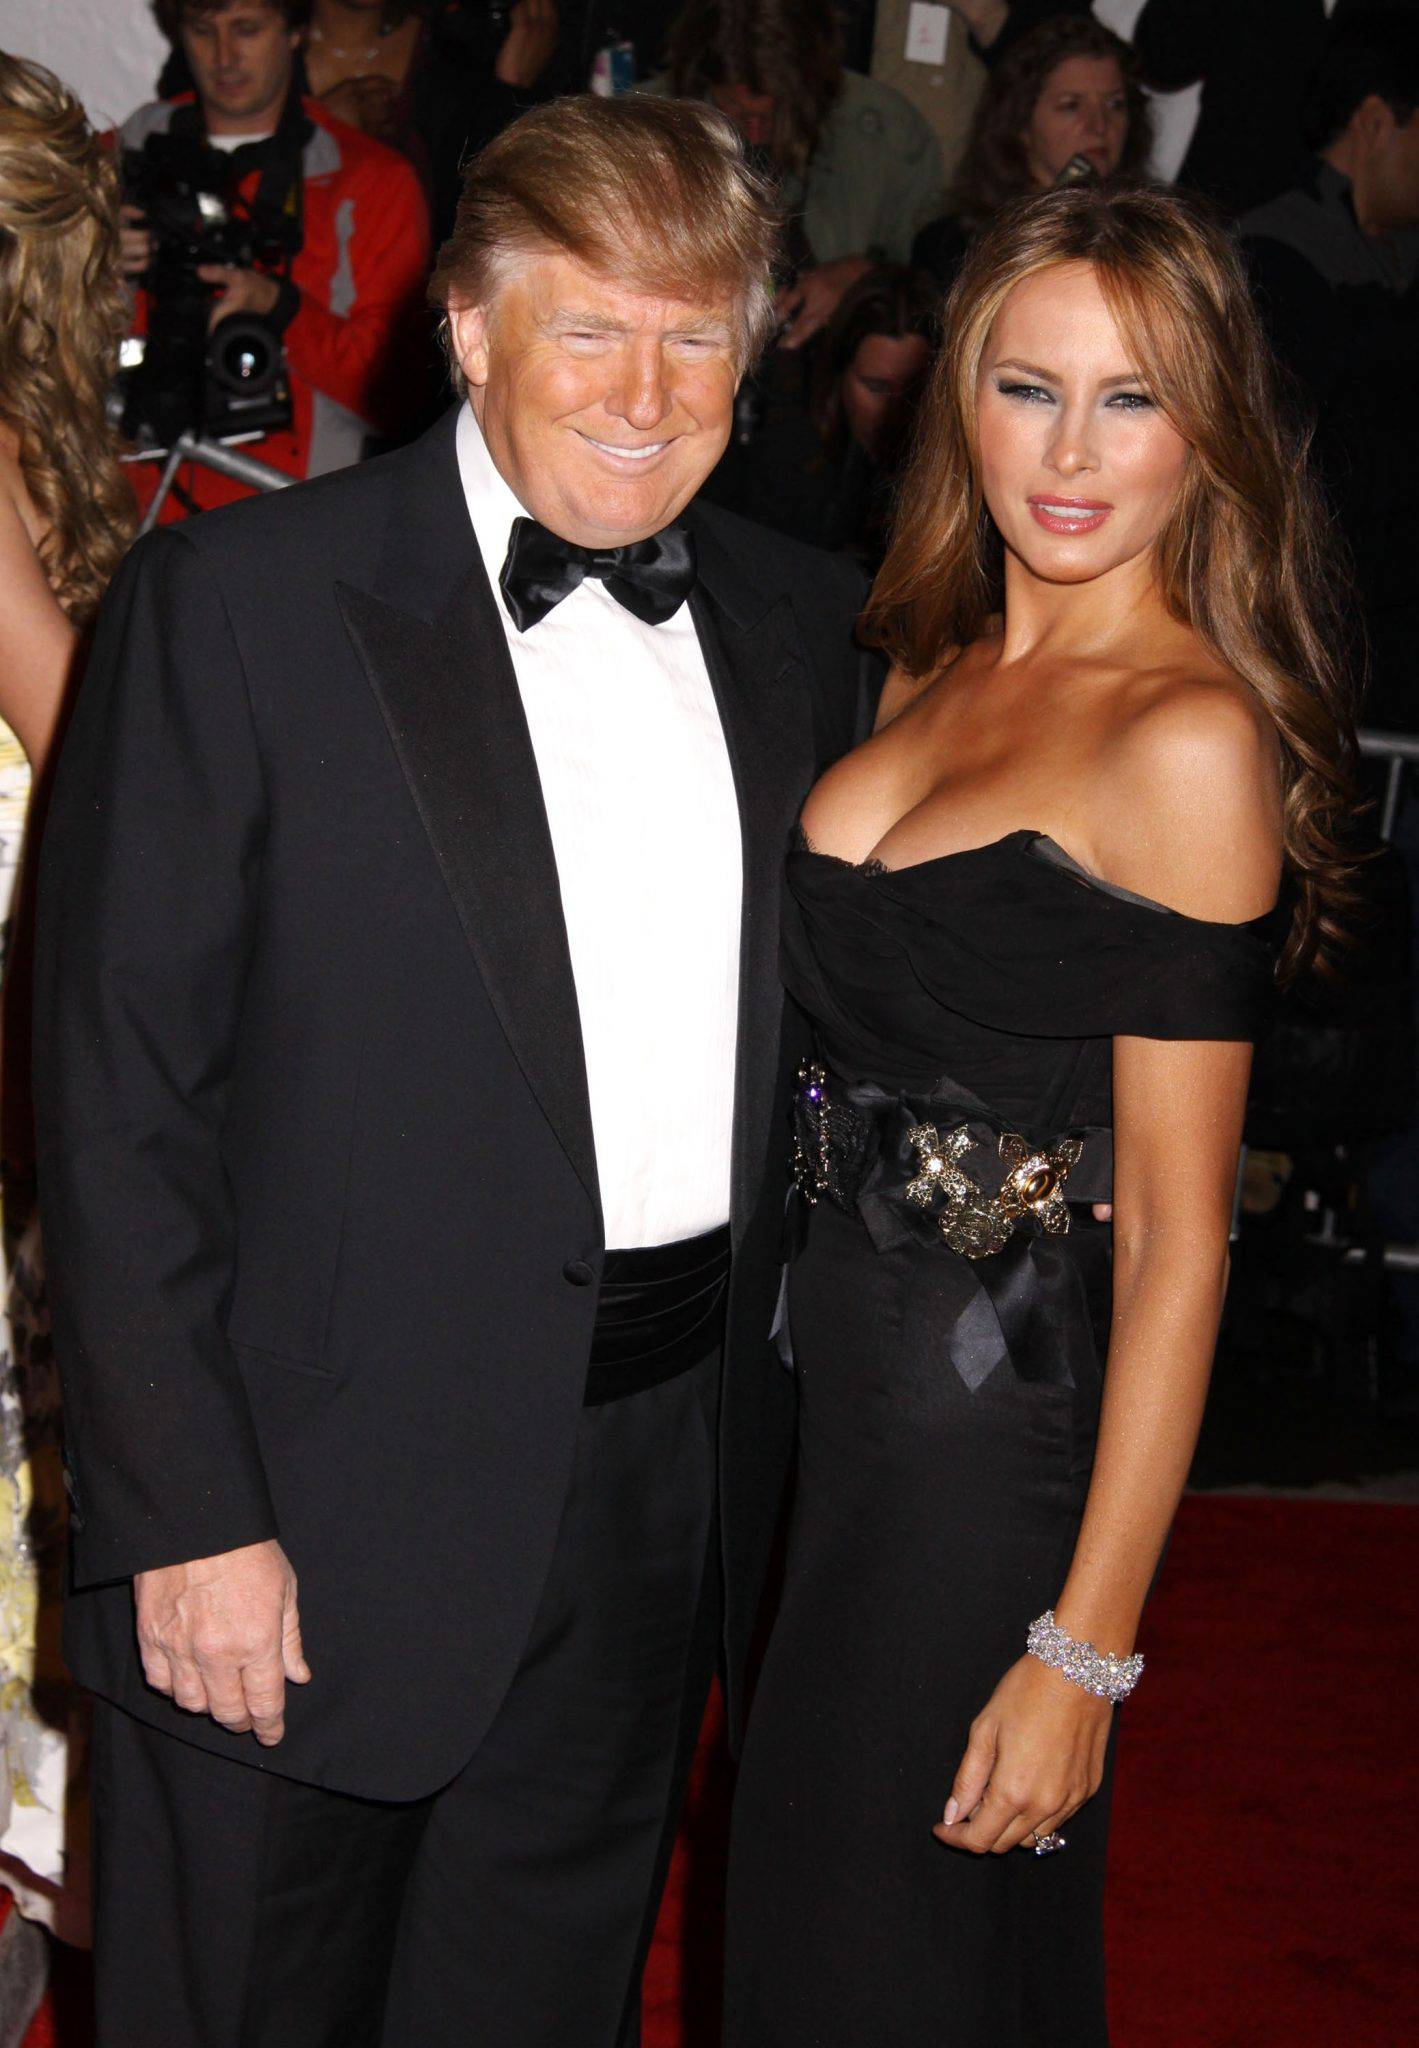 Melania Trump i Donald na MET Gala 2009